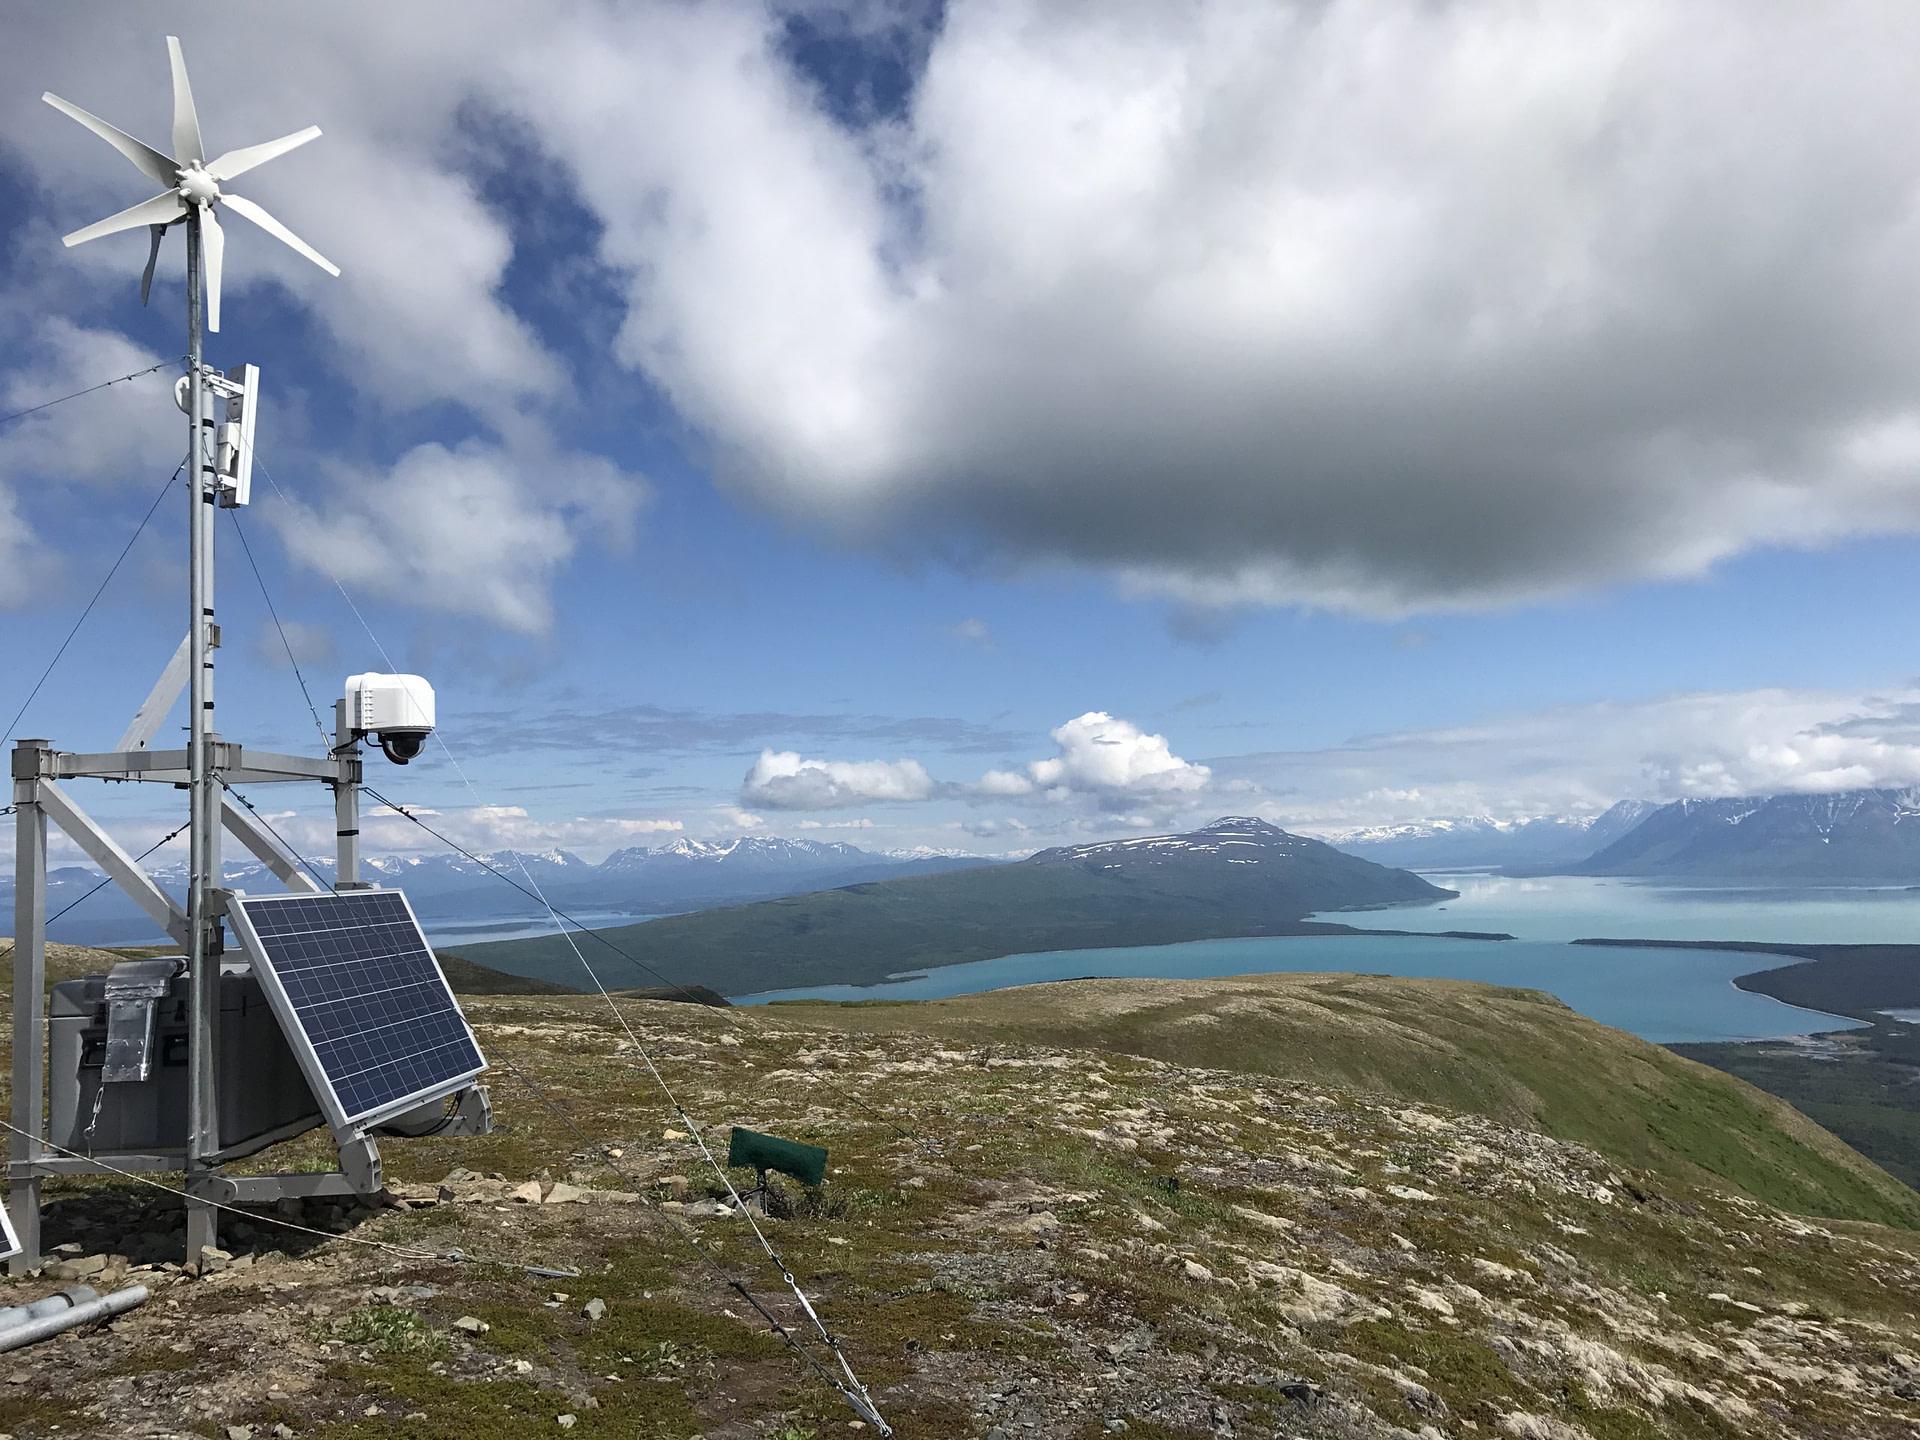 XRain Self Wiping Camera Enclosure System Installed On Dumpling Mountain In Katmai National Park Alaska Overlooking Brooks Camp